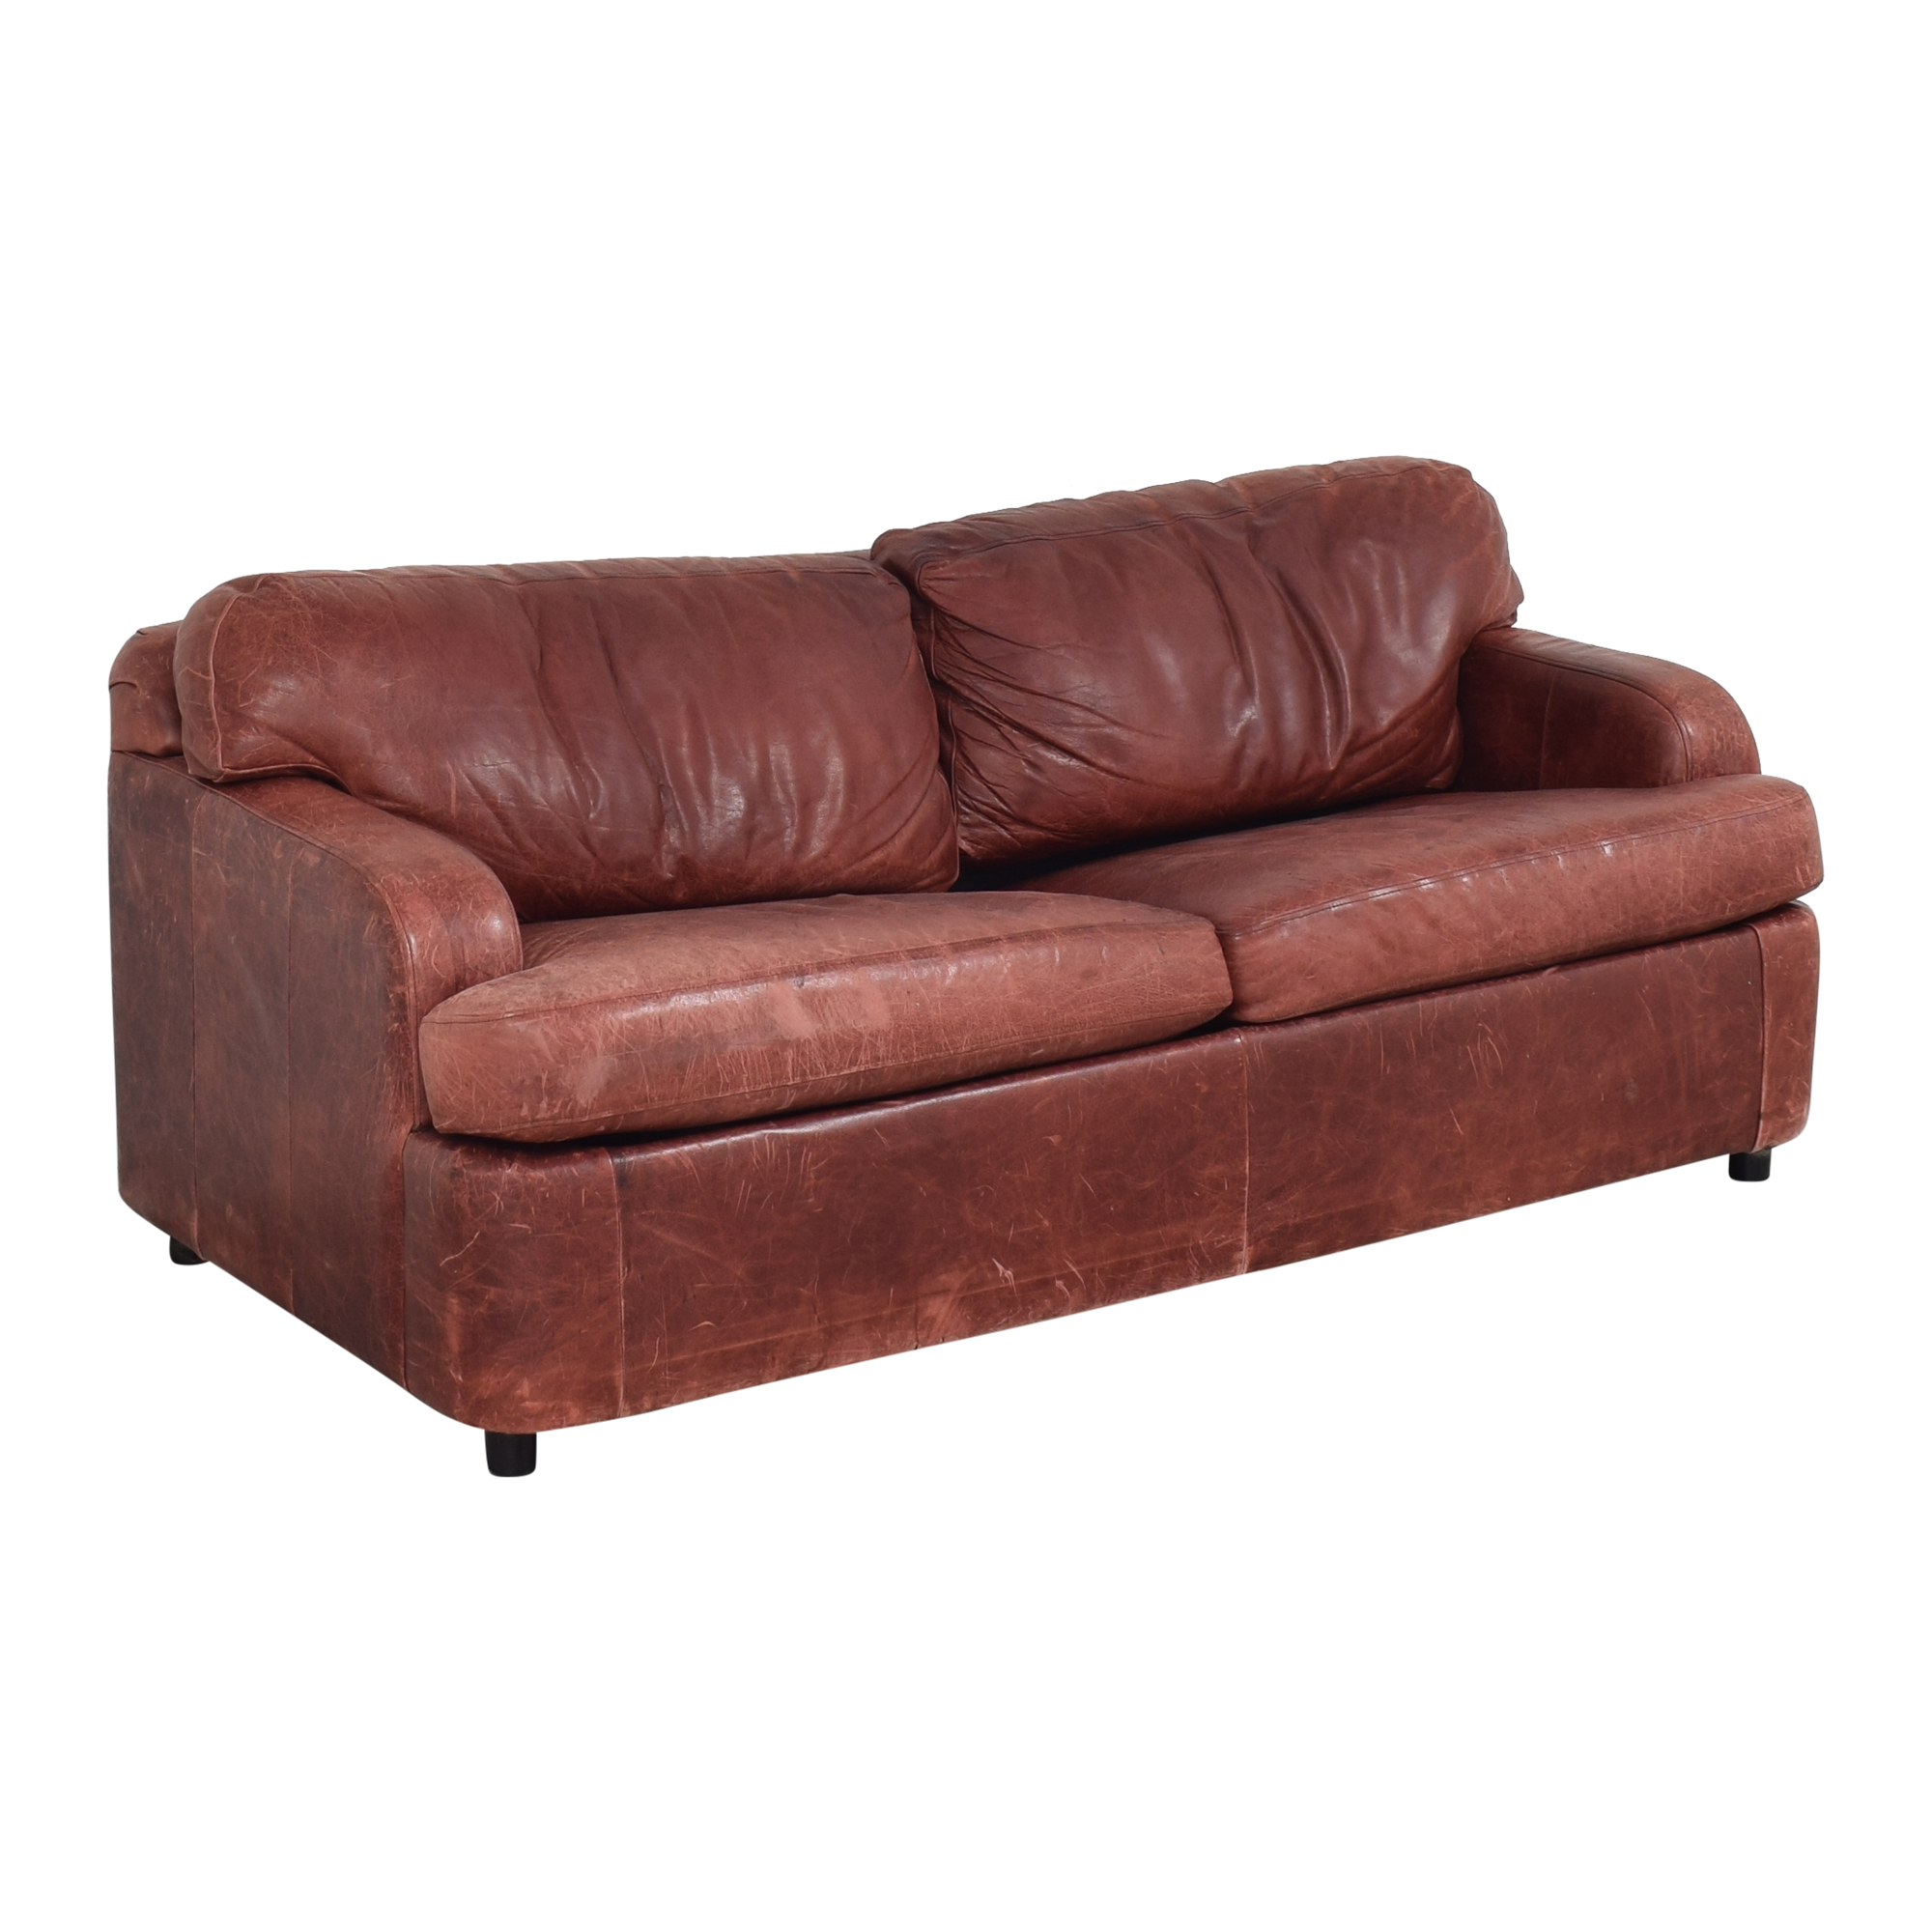 shop  Leather Sleeper Sofa online